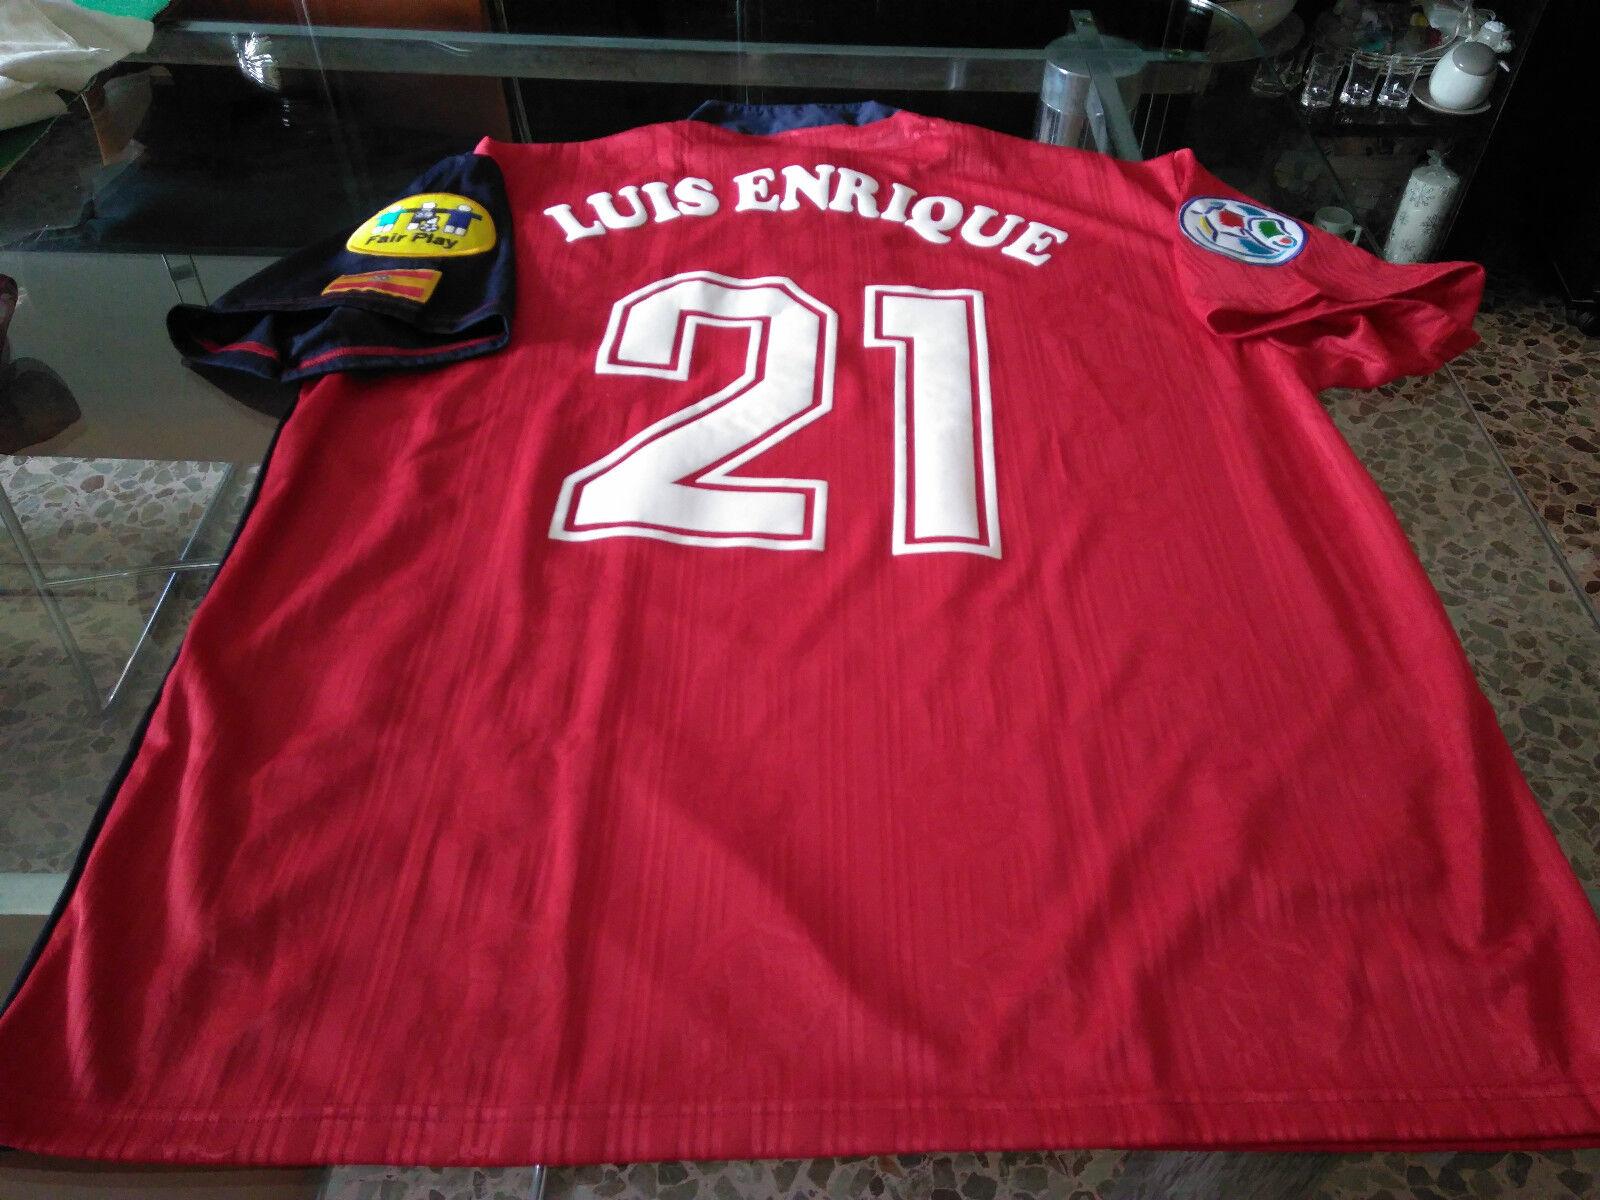 Maglia Luis Enrique Spagna Spain EURO 96 Shirt Jersey Camiseta